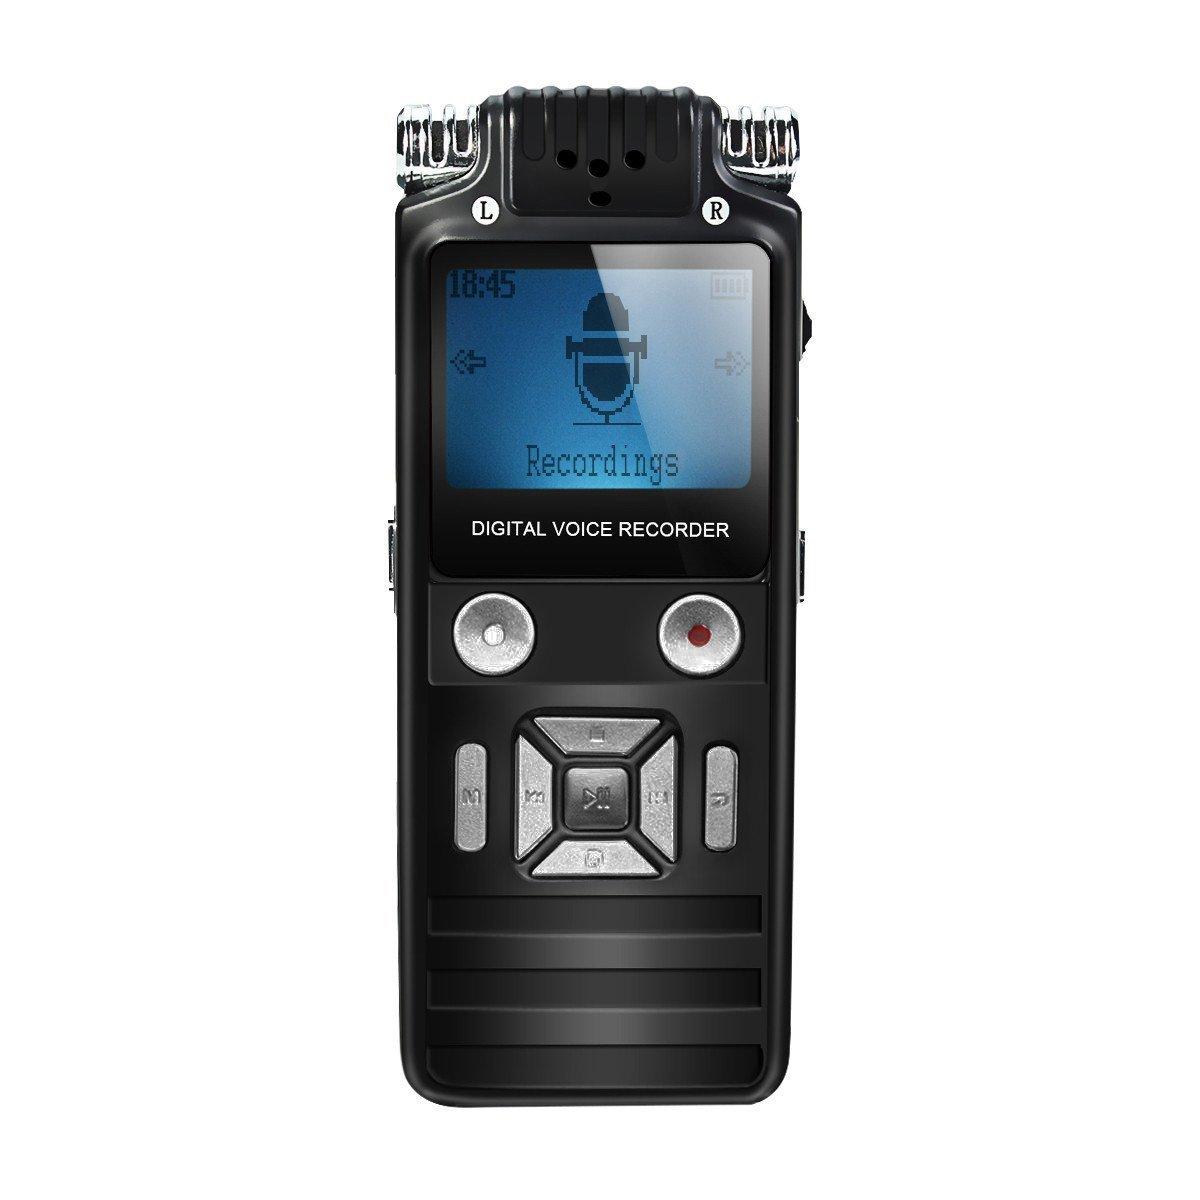 Voice Recorders, EIVOTOR 8GB Digital Audio Sound Recorder Dictaphone, Voice Activated Recorder with Headphones, MP3 Player, Auto Saving File, Noise Reduction